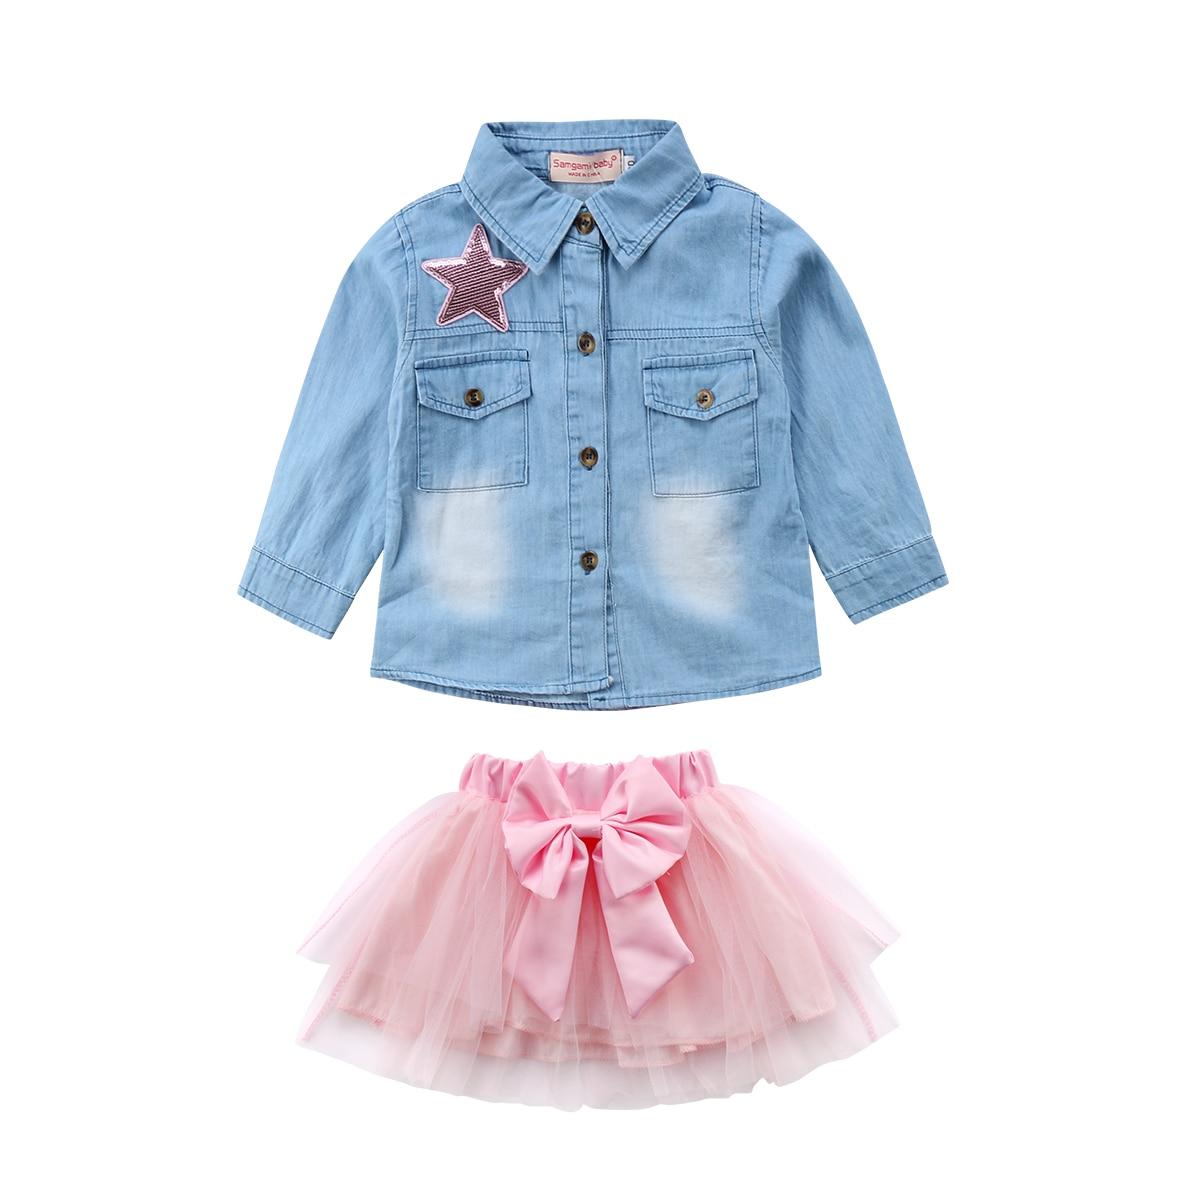 dcbcea5fd Niñas camiseta top de manga larga Tutu falda arco 2 unids ropa Set 2 unids  niño